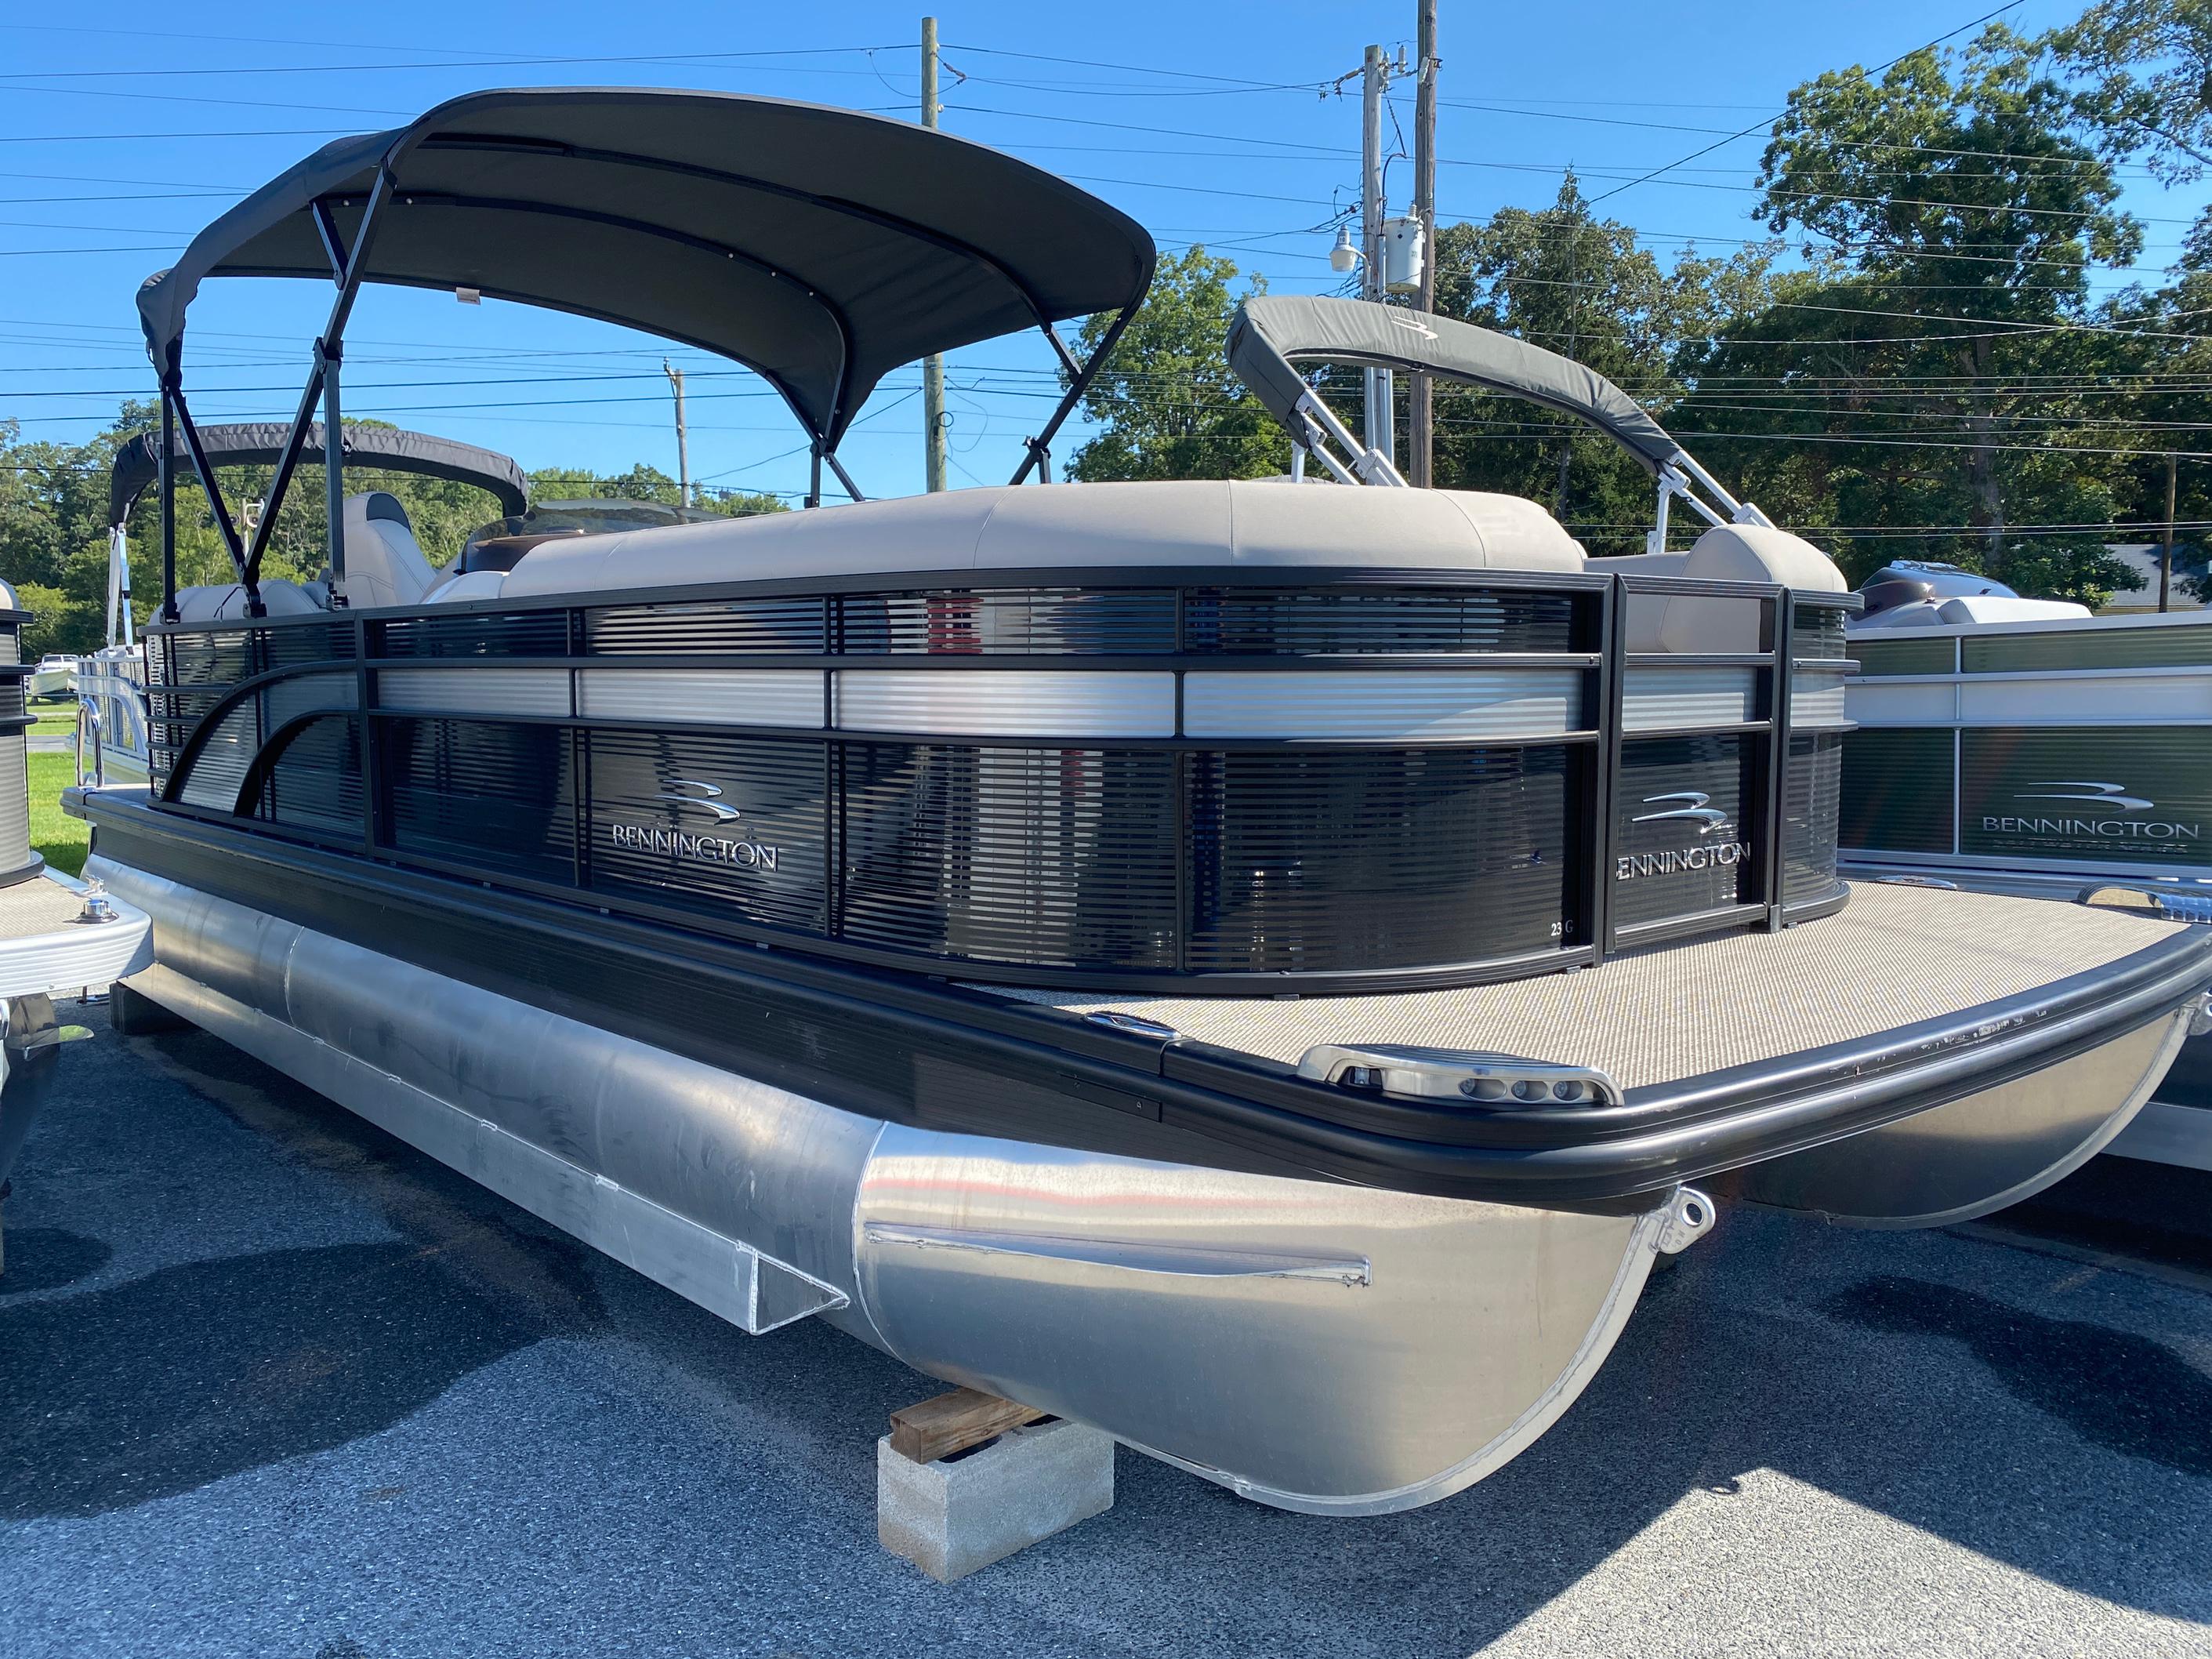 2019 Bennington boat for sale, model of the boat is 23 GSR & Image # 1 of 3